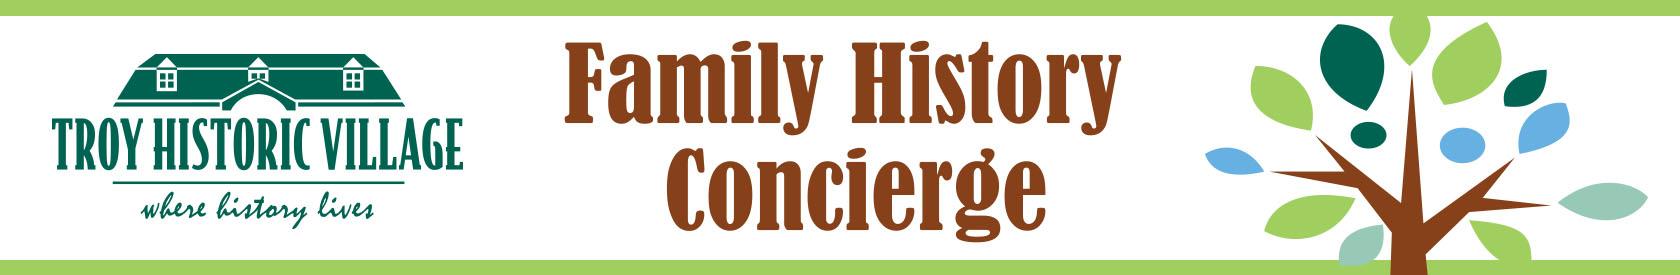 Family History Concierge